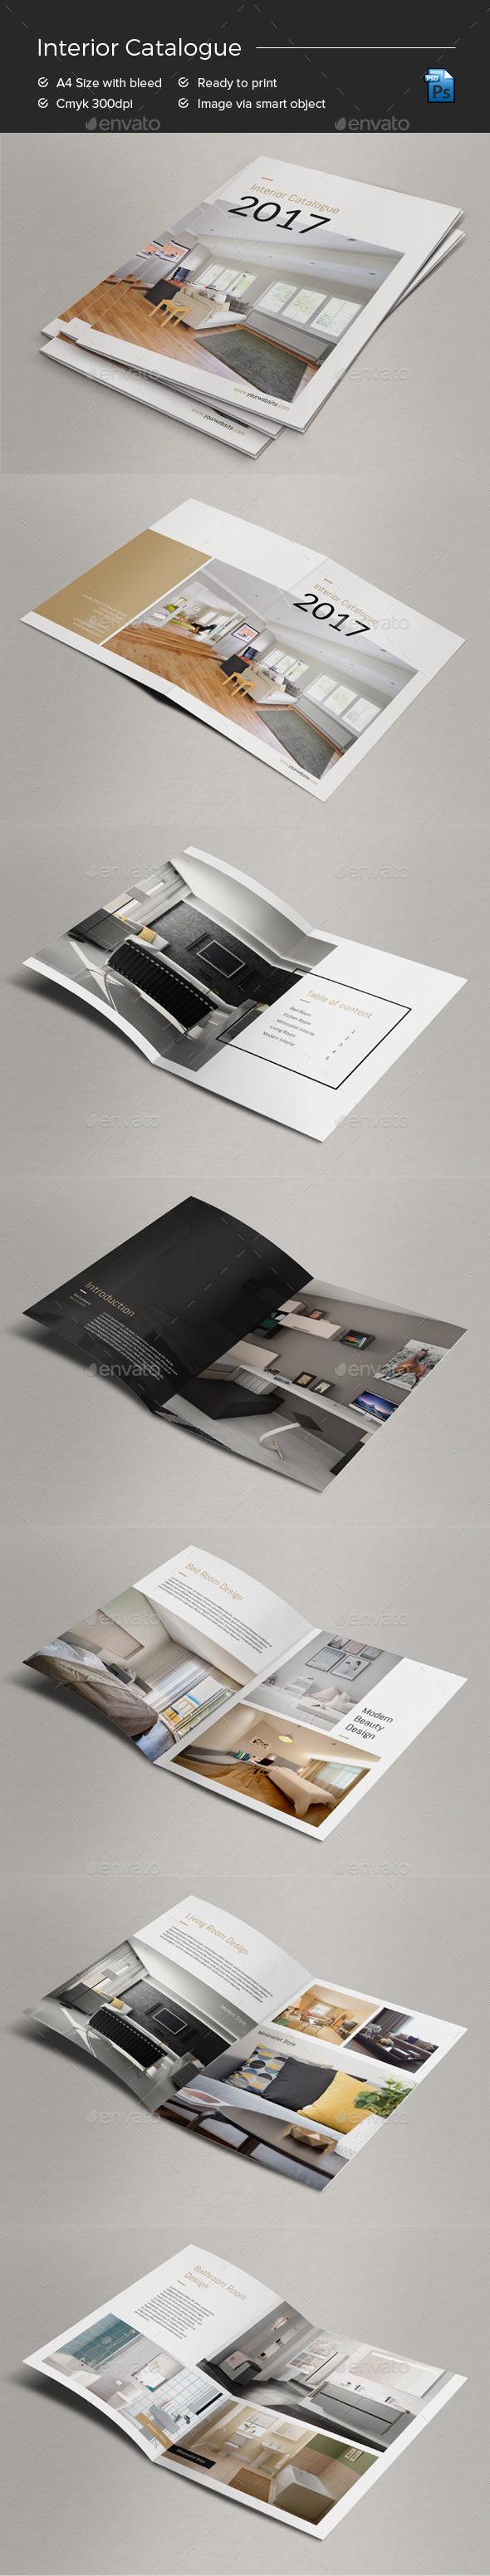 Interior Catalogue - Catalogs Brochures